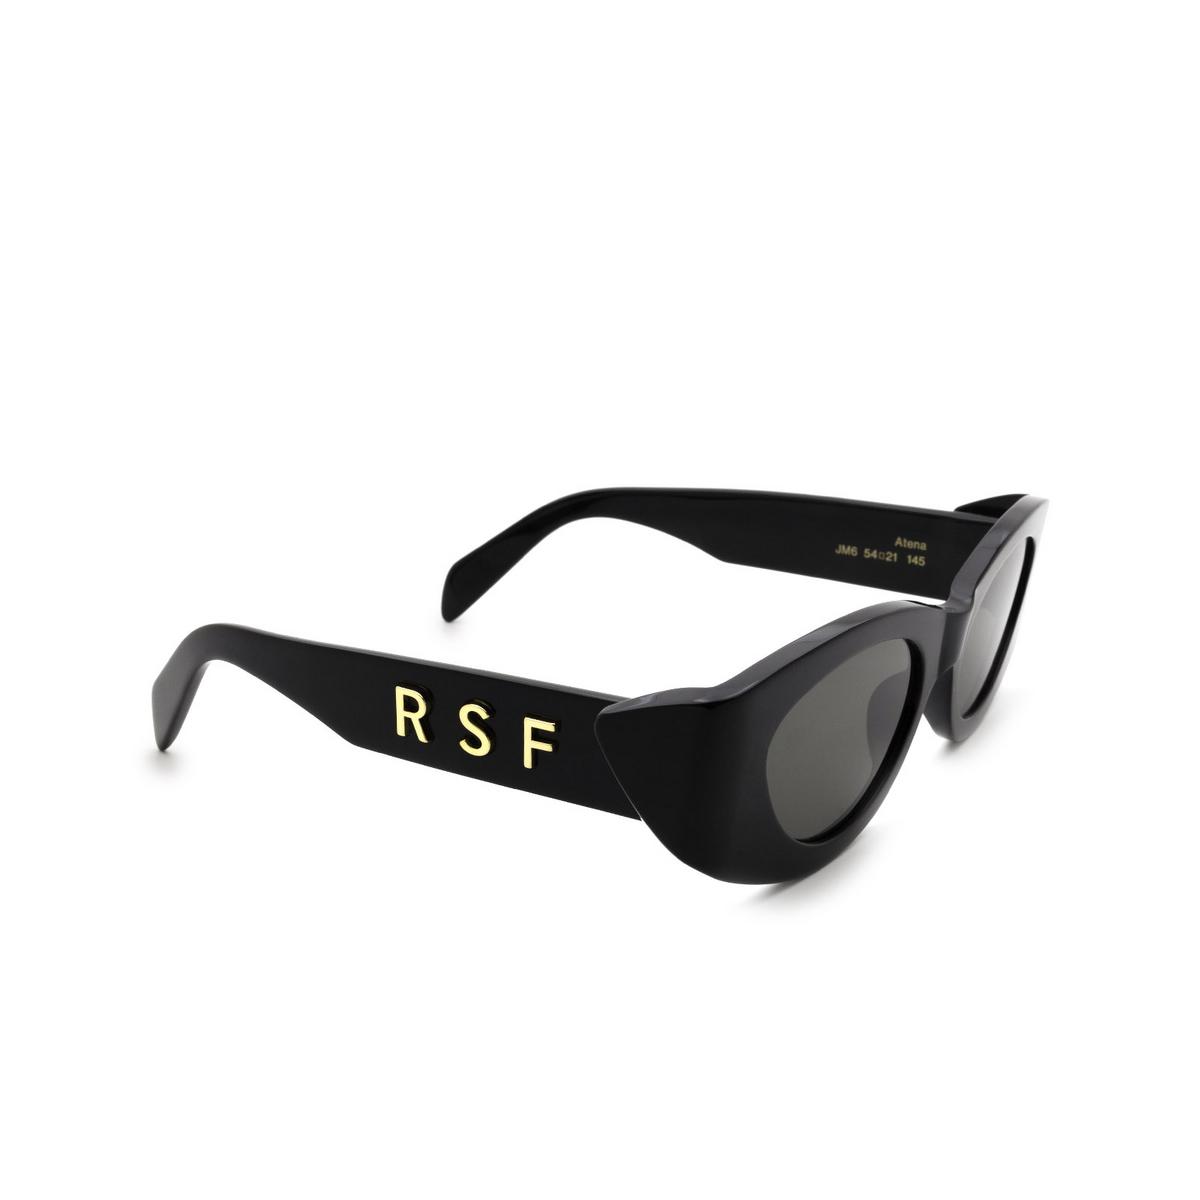 Retrosuperfuture® Oval Sunglasses: Atena color Black JM6 - three-quarters view.